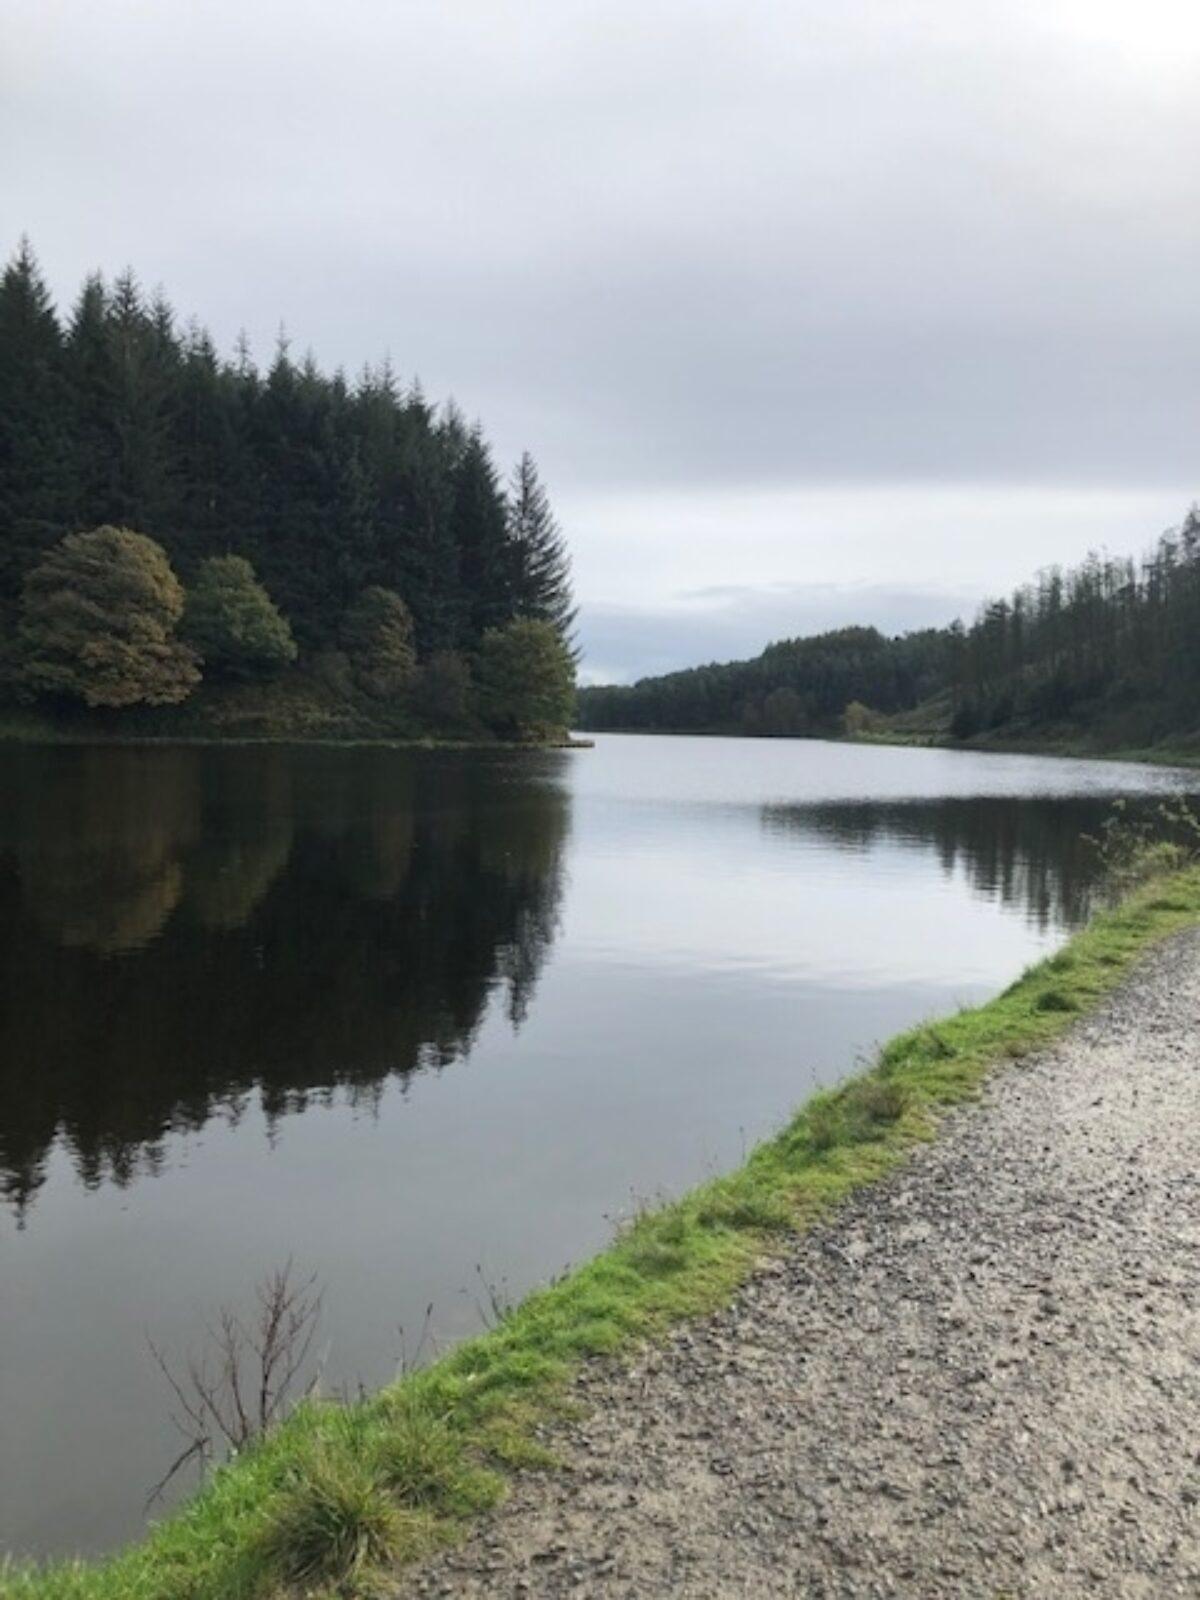 Entwistle and Turton Reservoir large photo 2